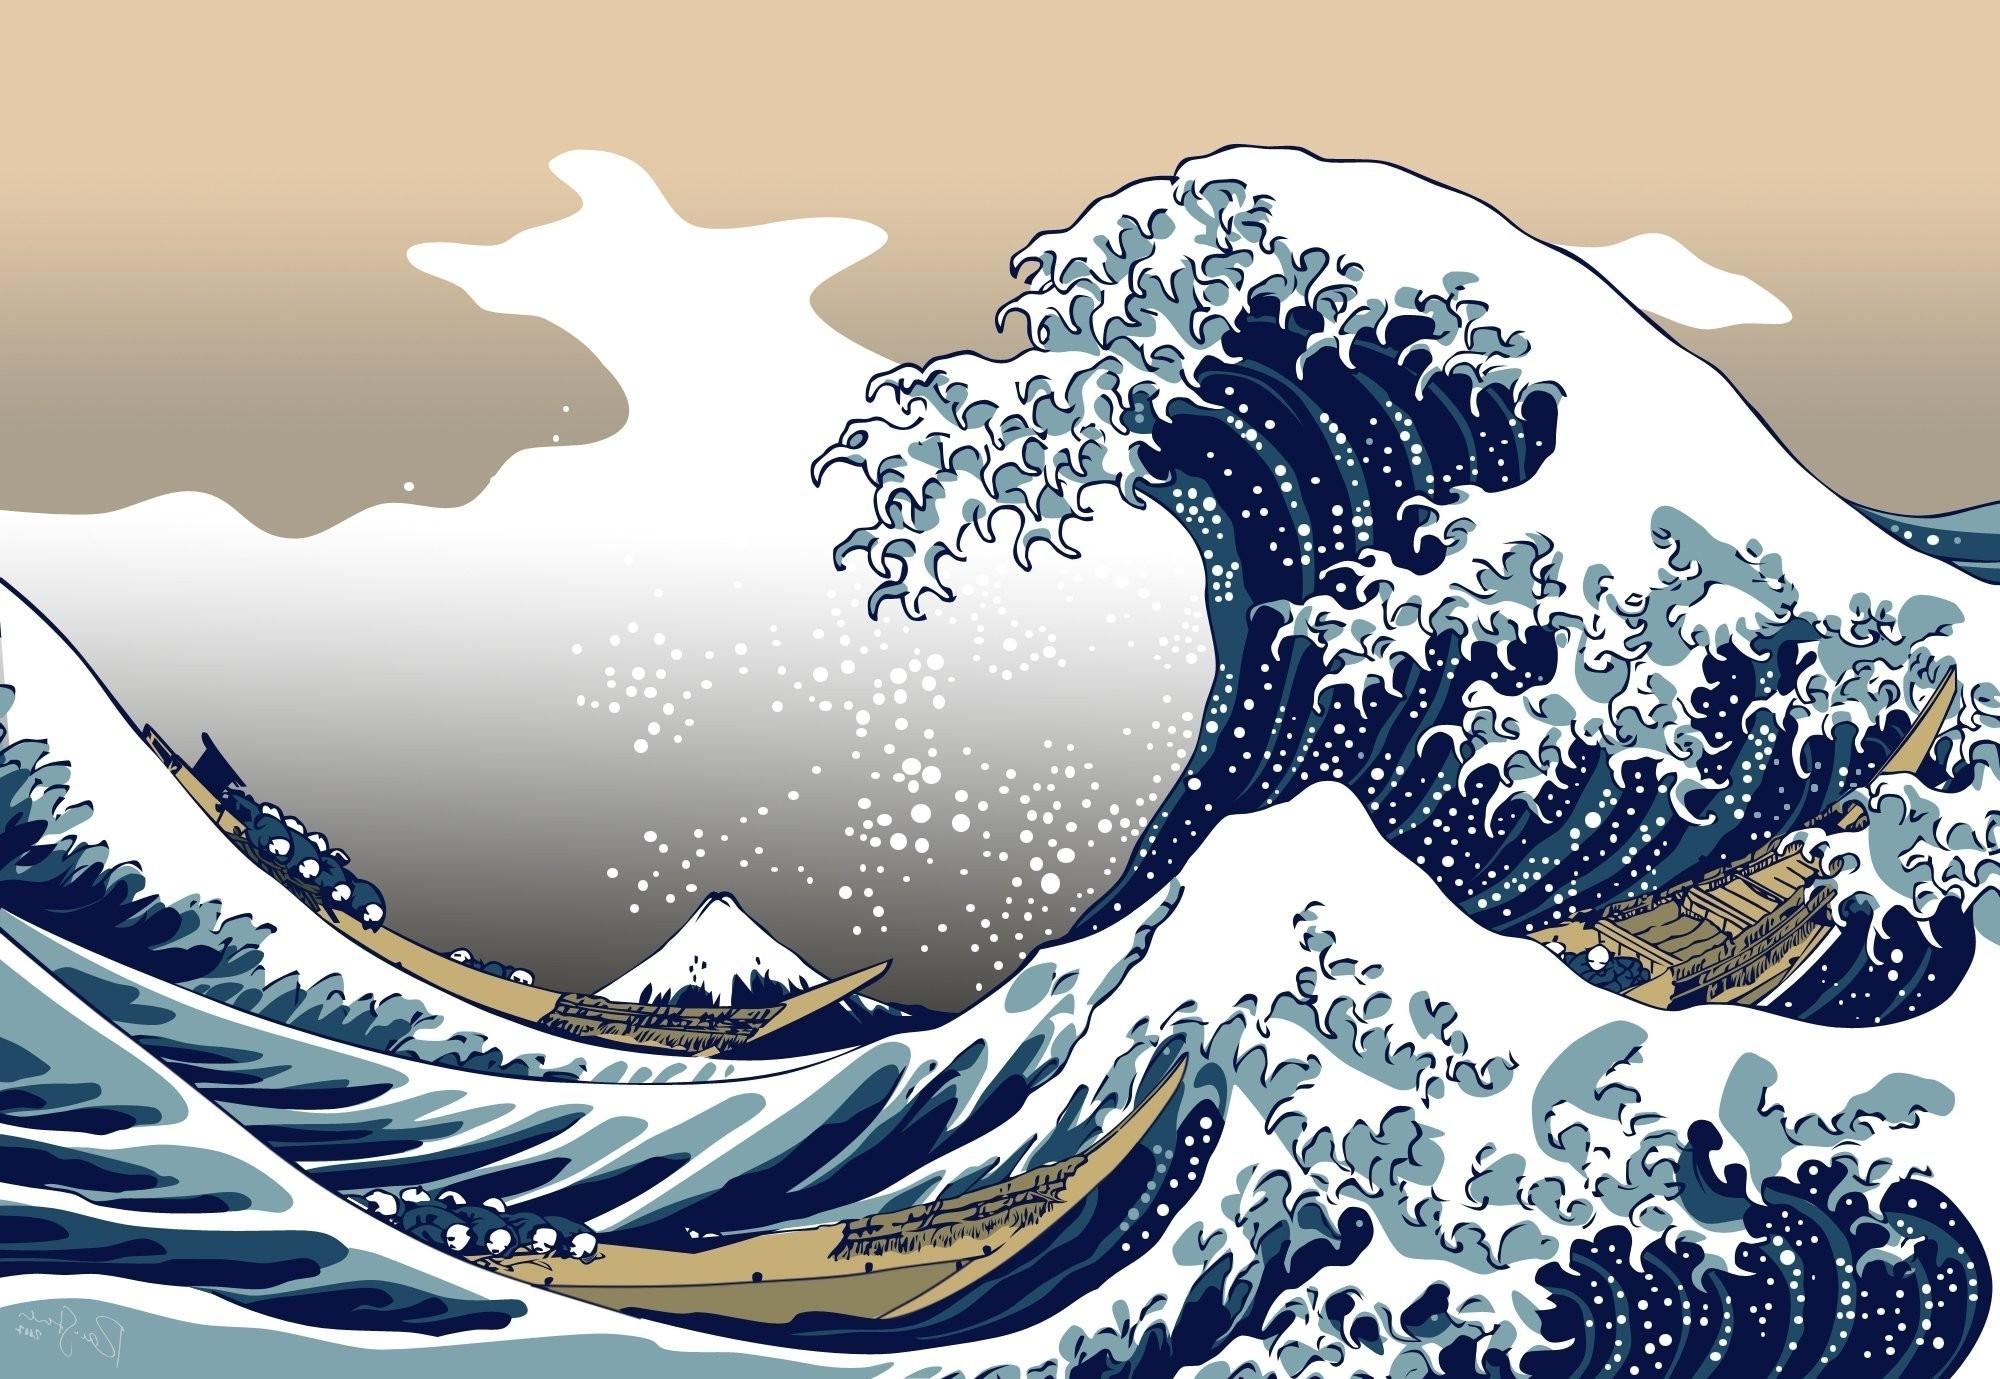 nature, blue, the great wave off kanagawa wallpapers hd / desktop